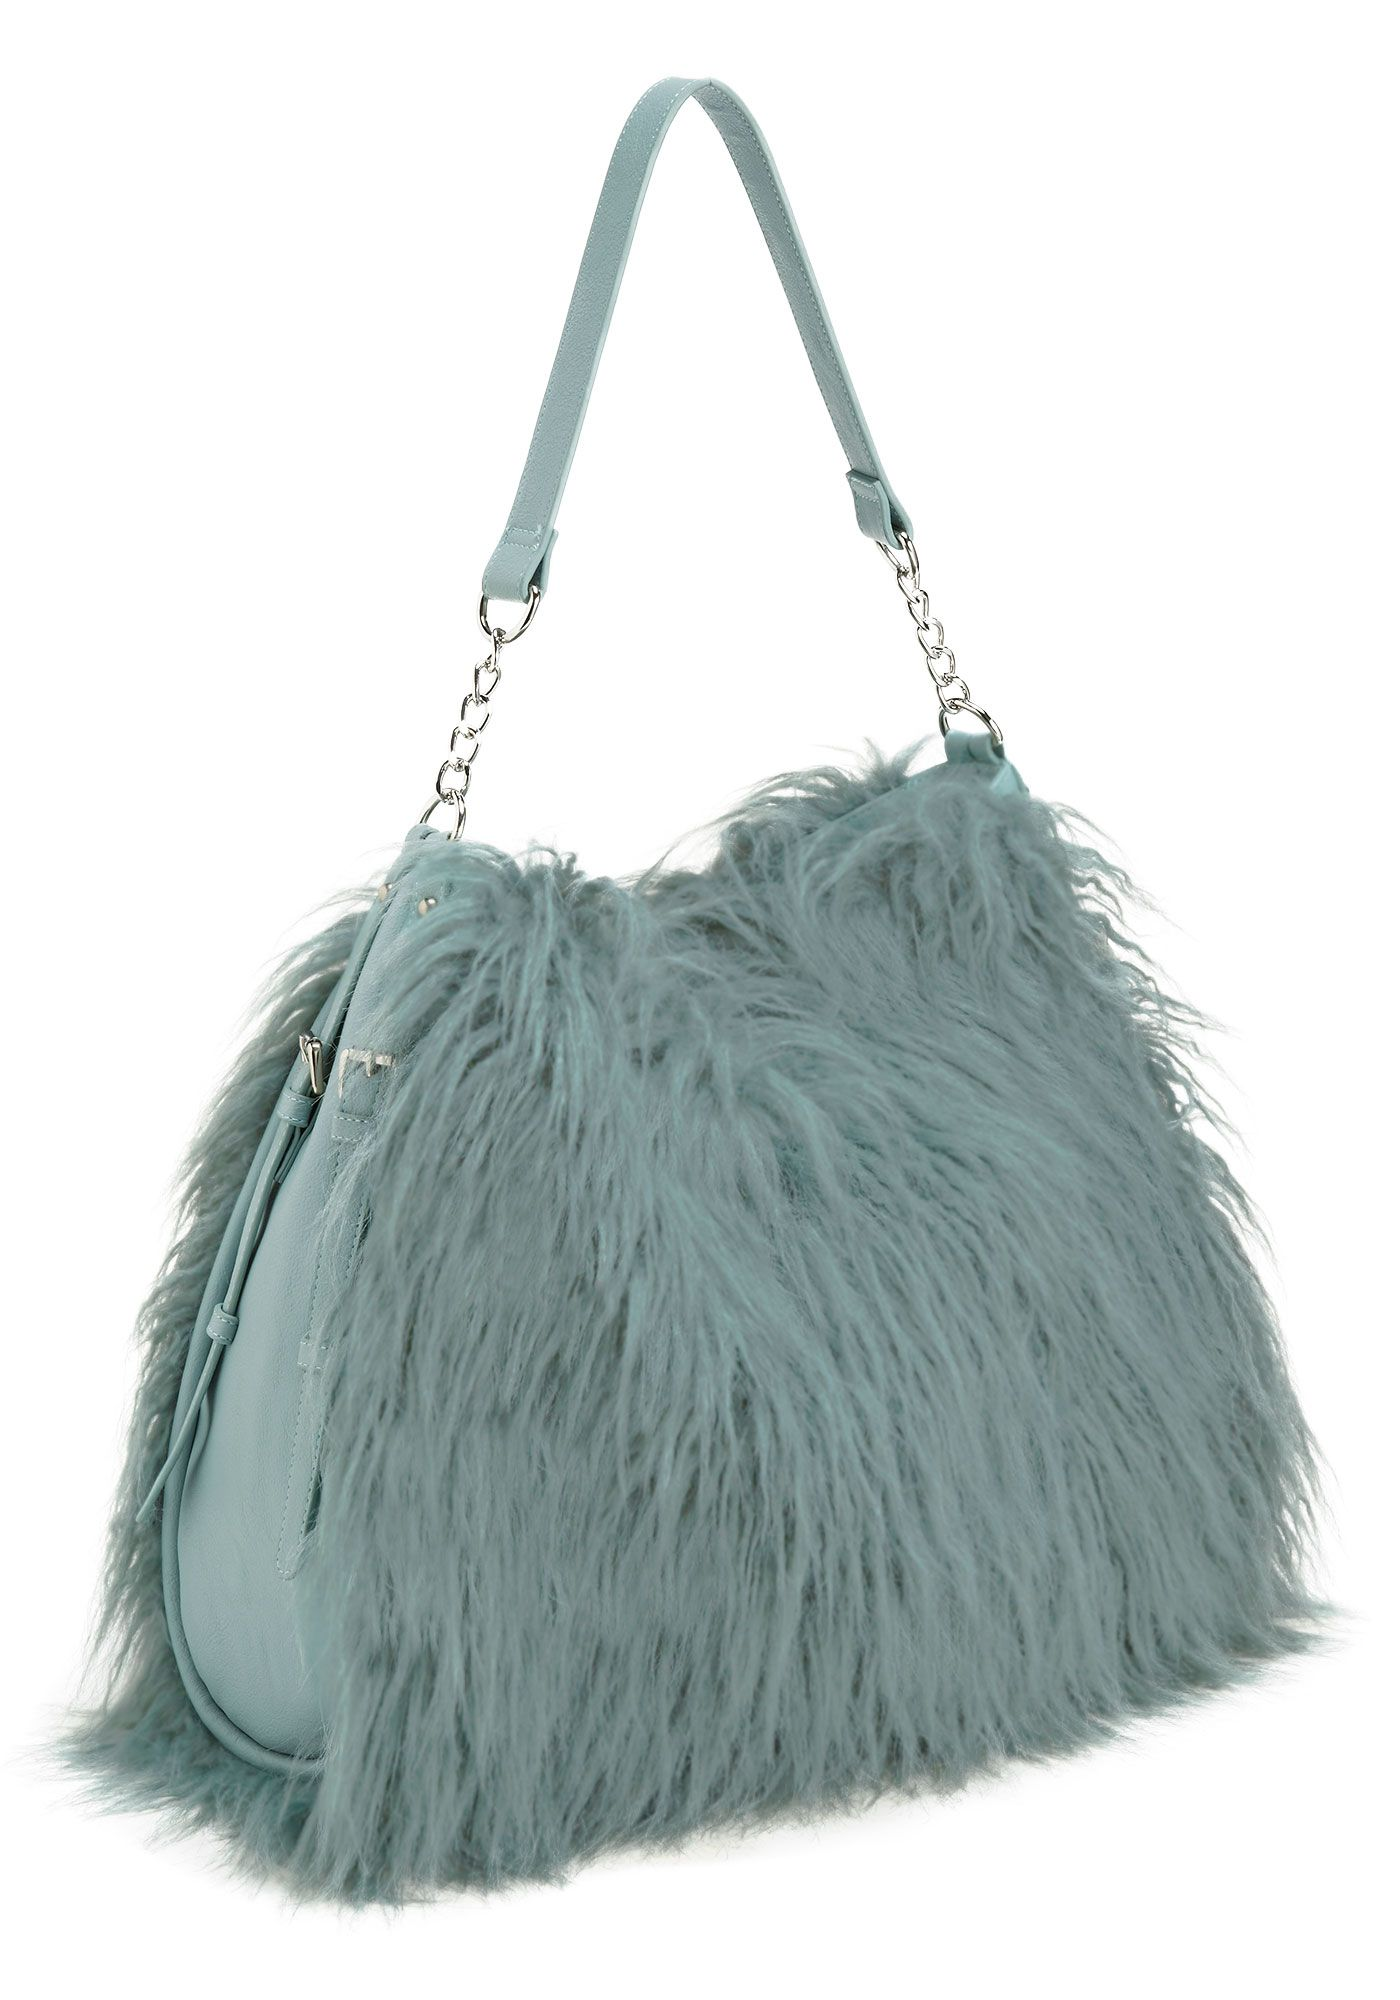 f8609c83a4e2 Dusty Teal Tibetan Lamb Faux Fur Hobo Bag